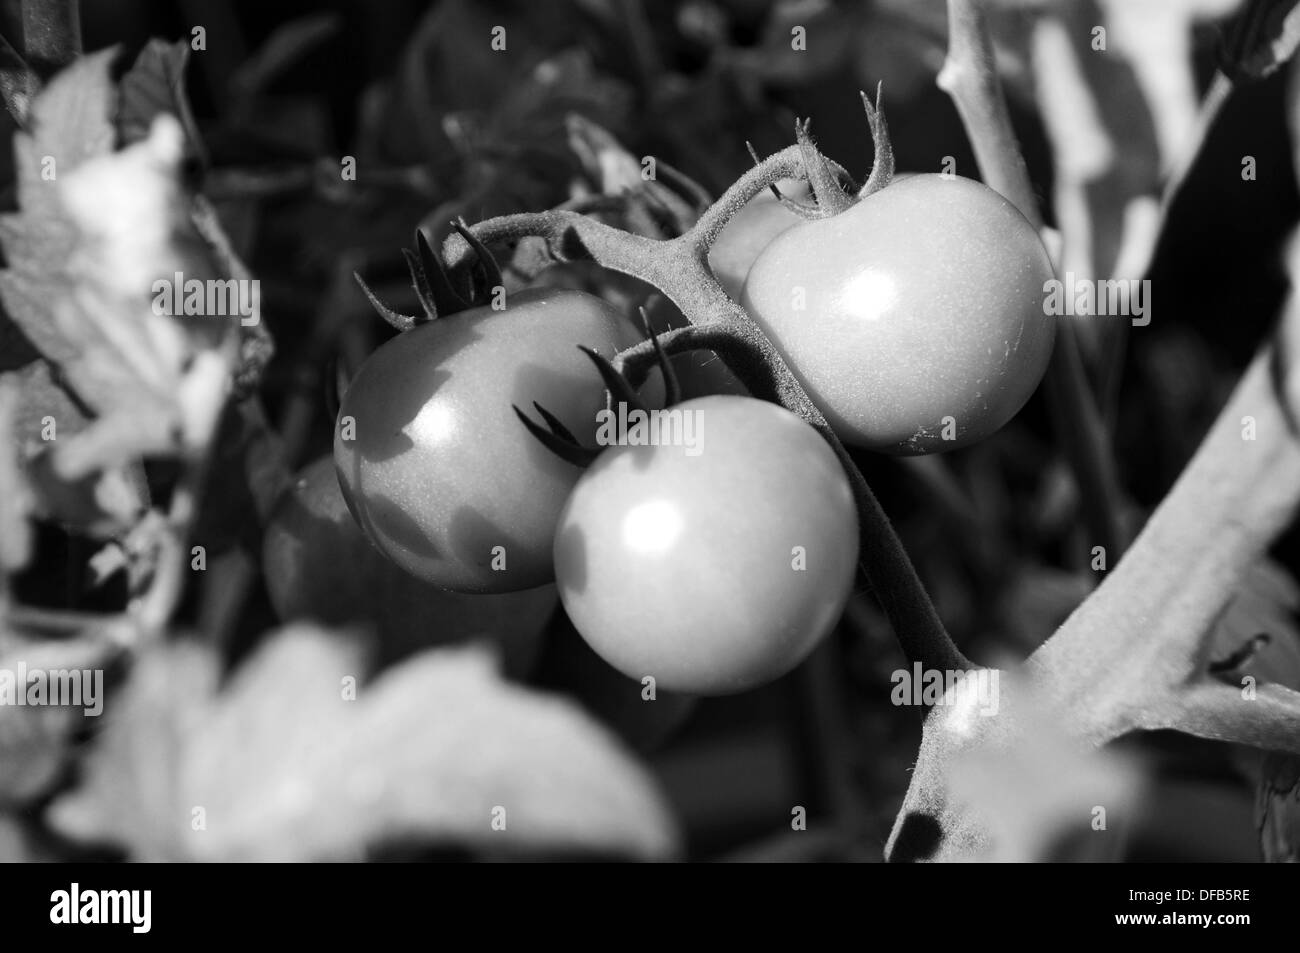 Ripe tomatoes - Stock Image